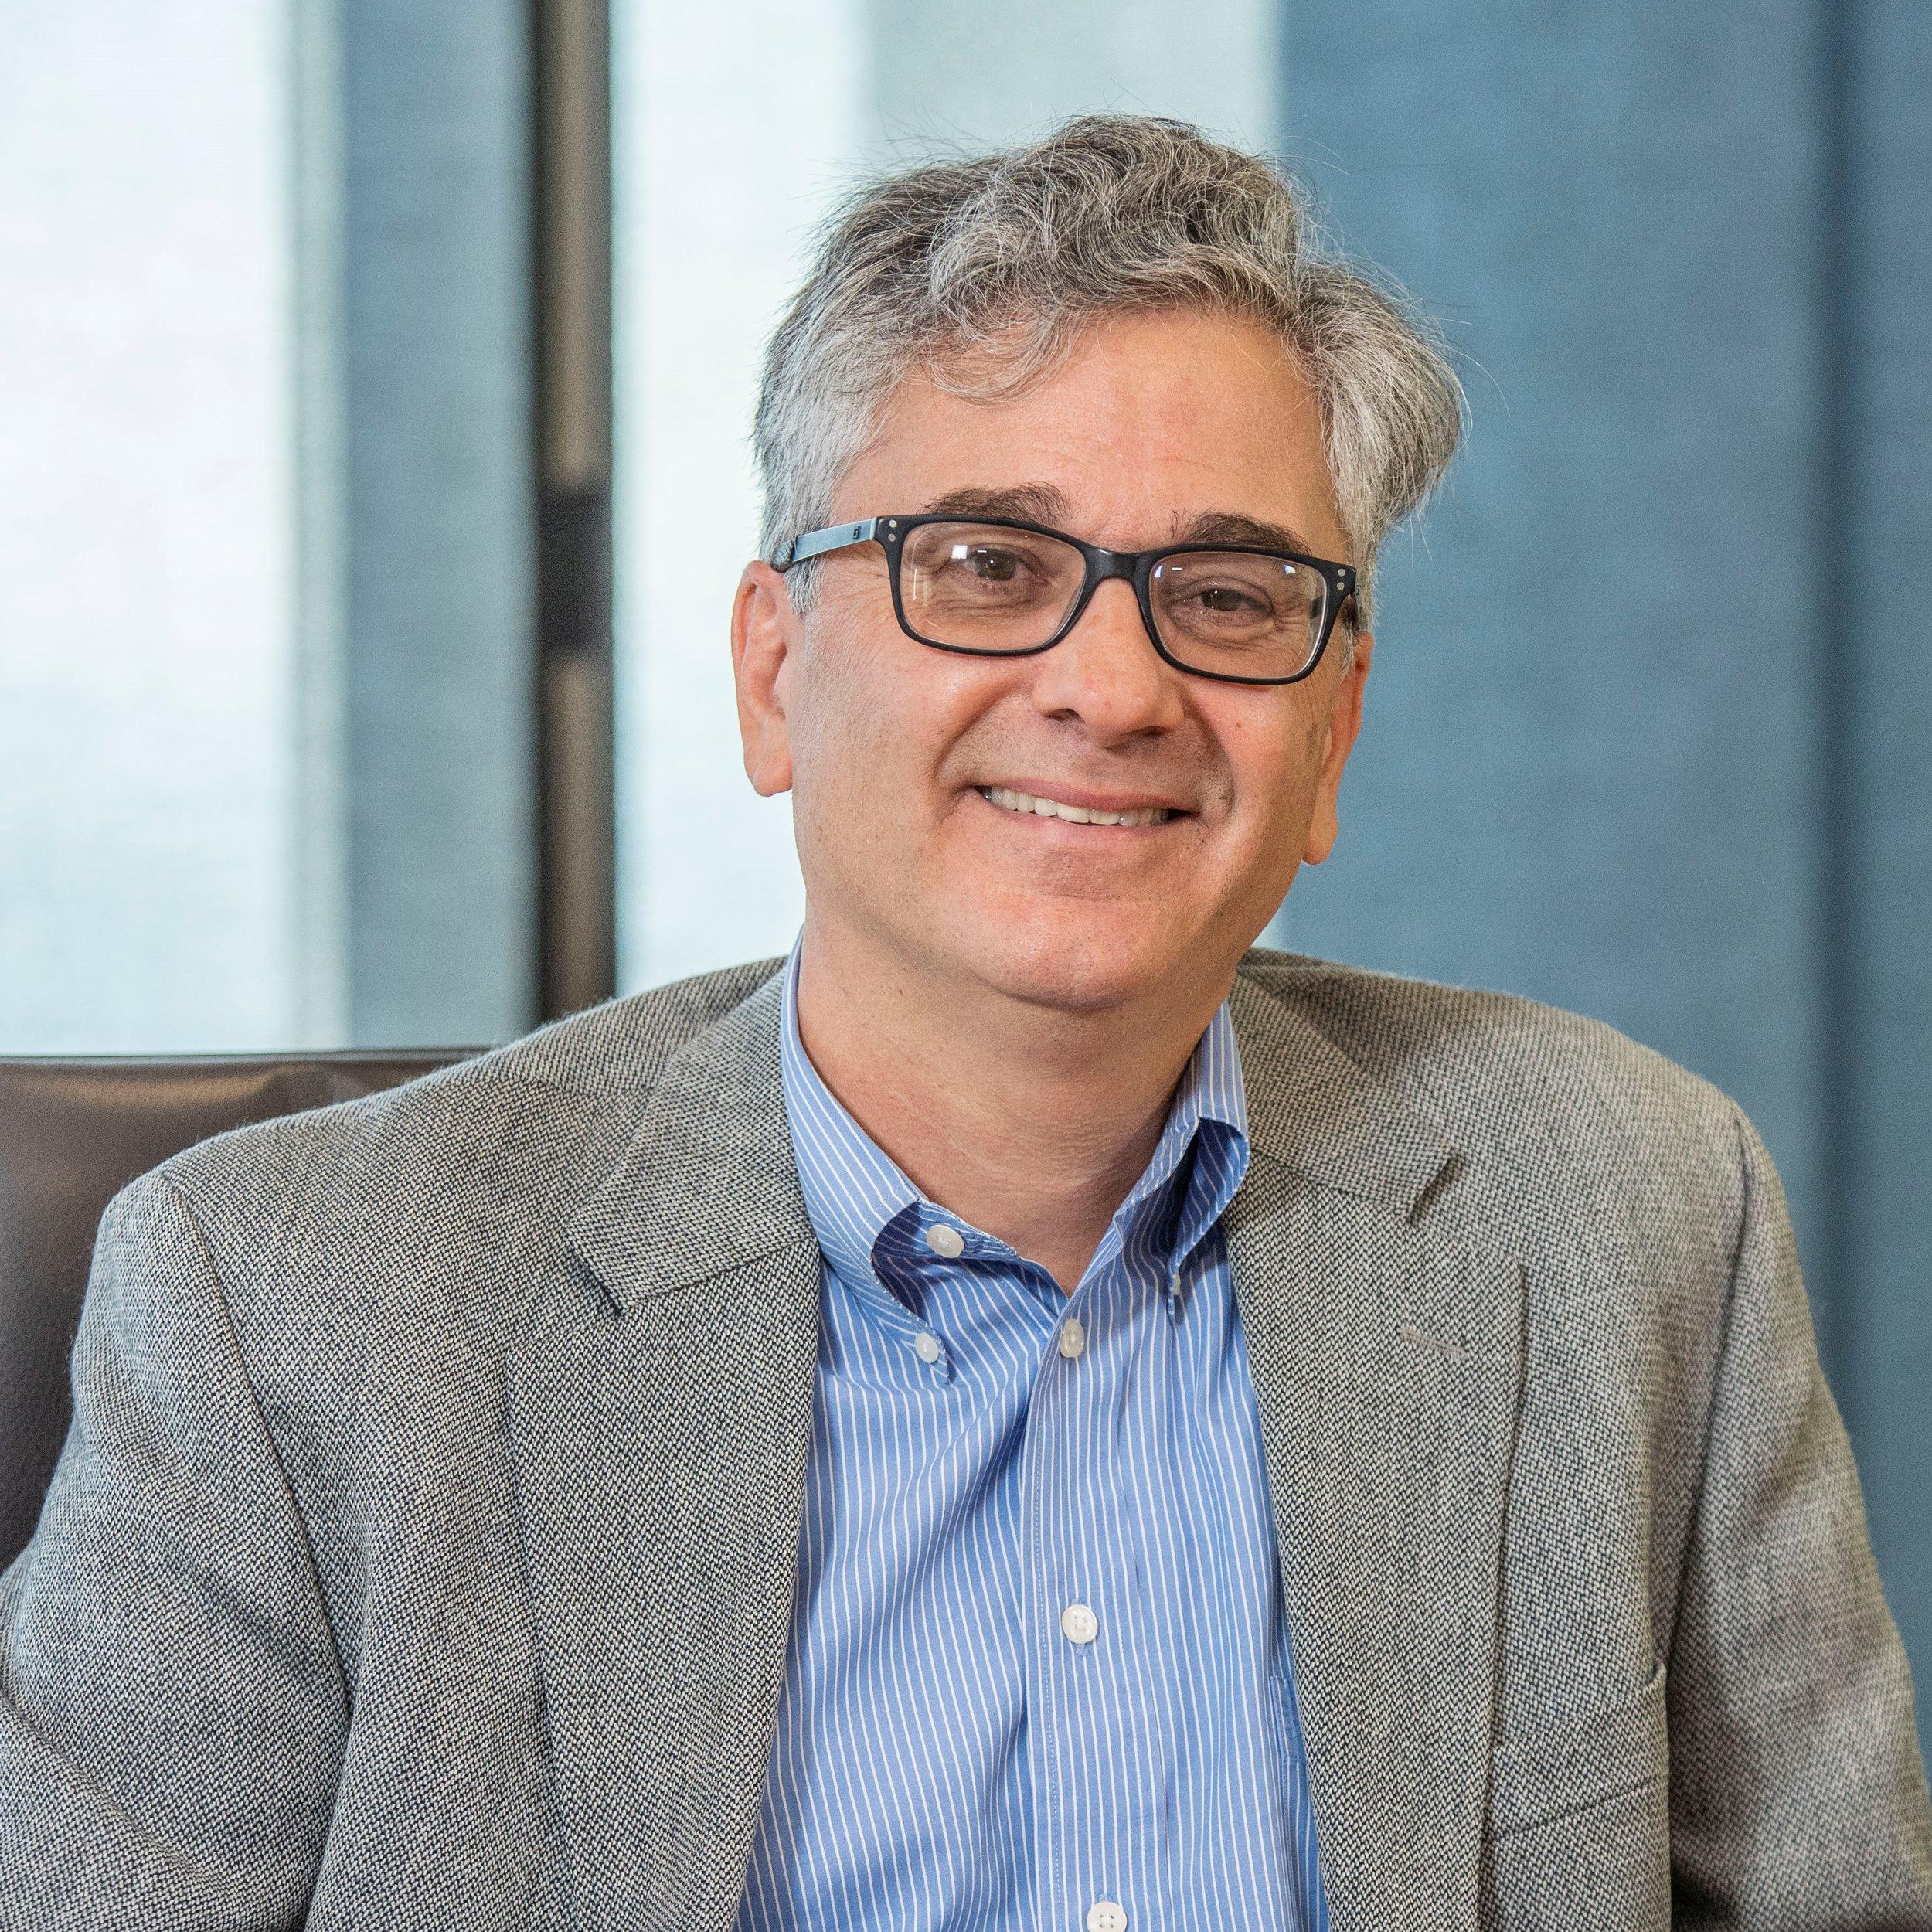 Vincent Schiraldi - Co-ChairCo-Director, Columbia Justice Lab